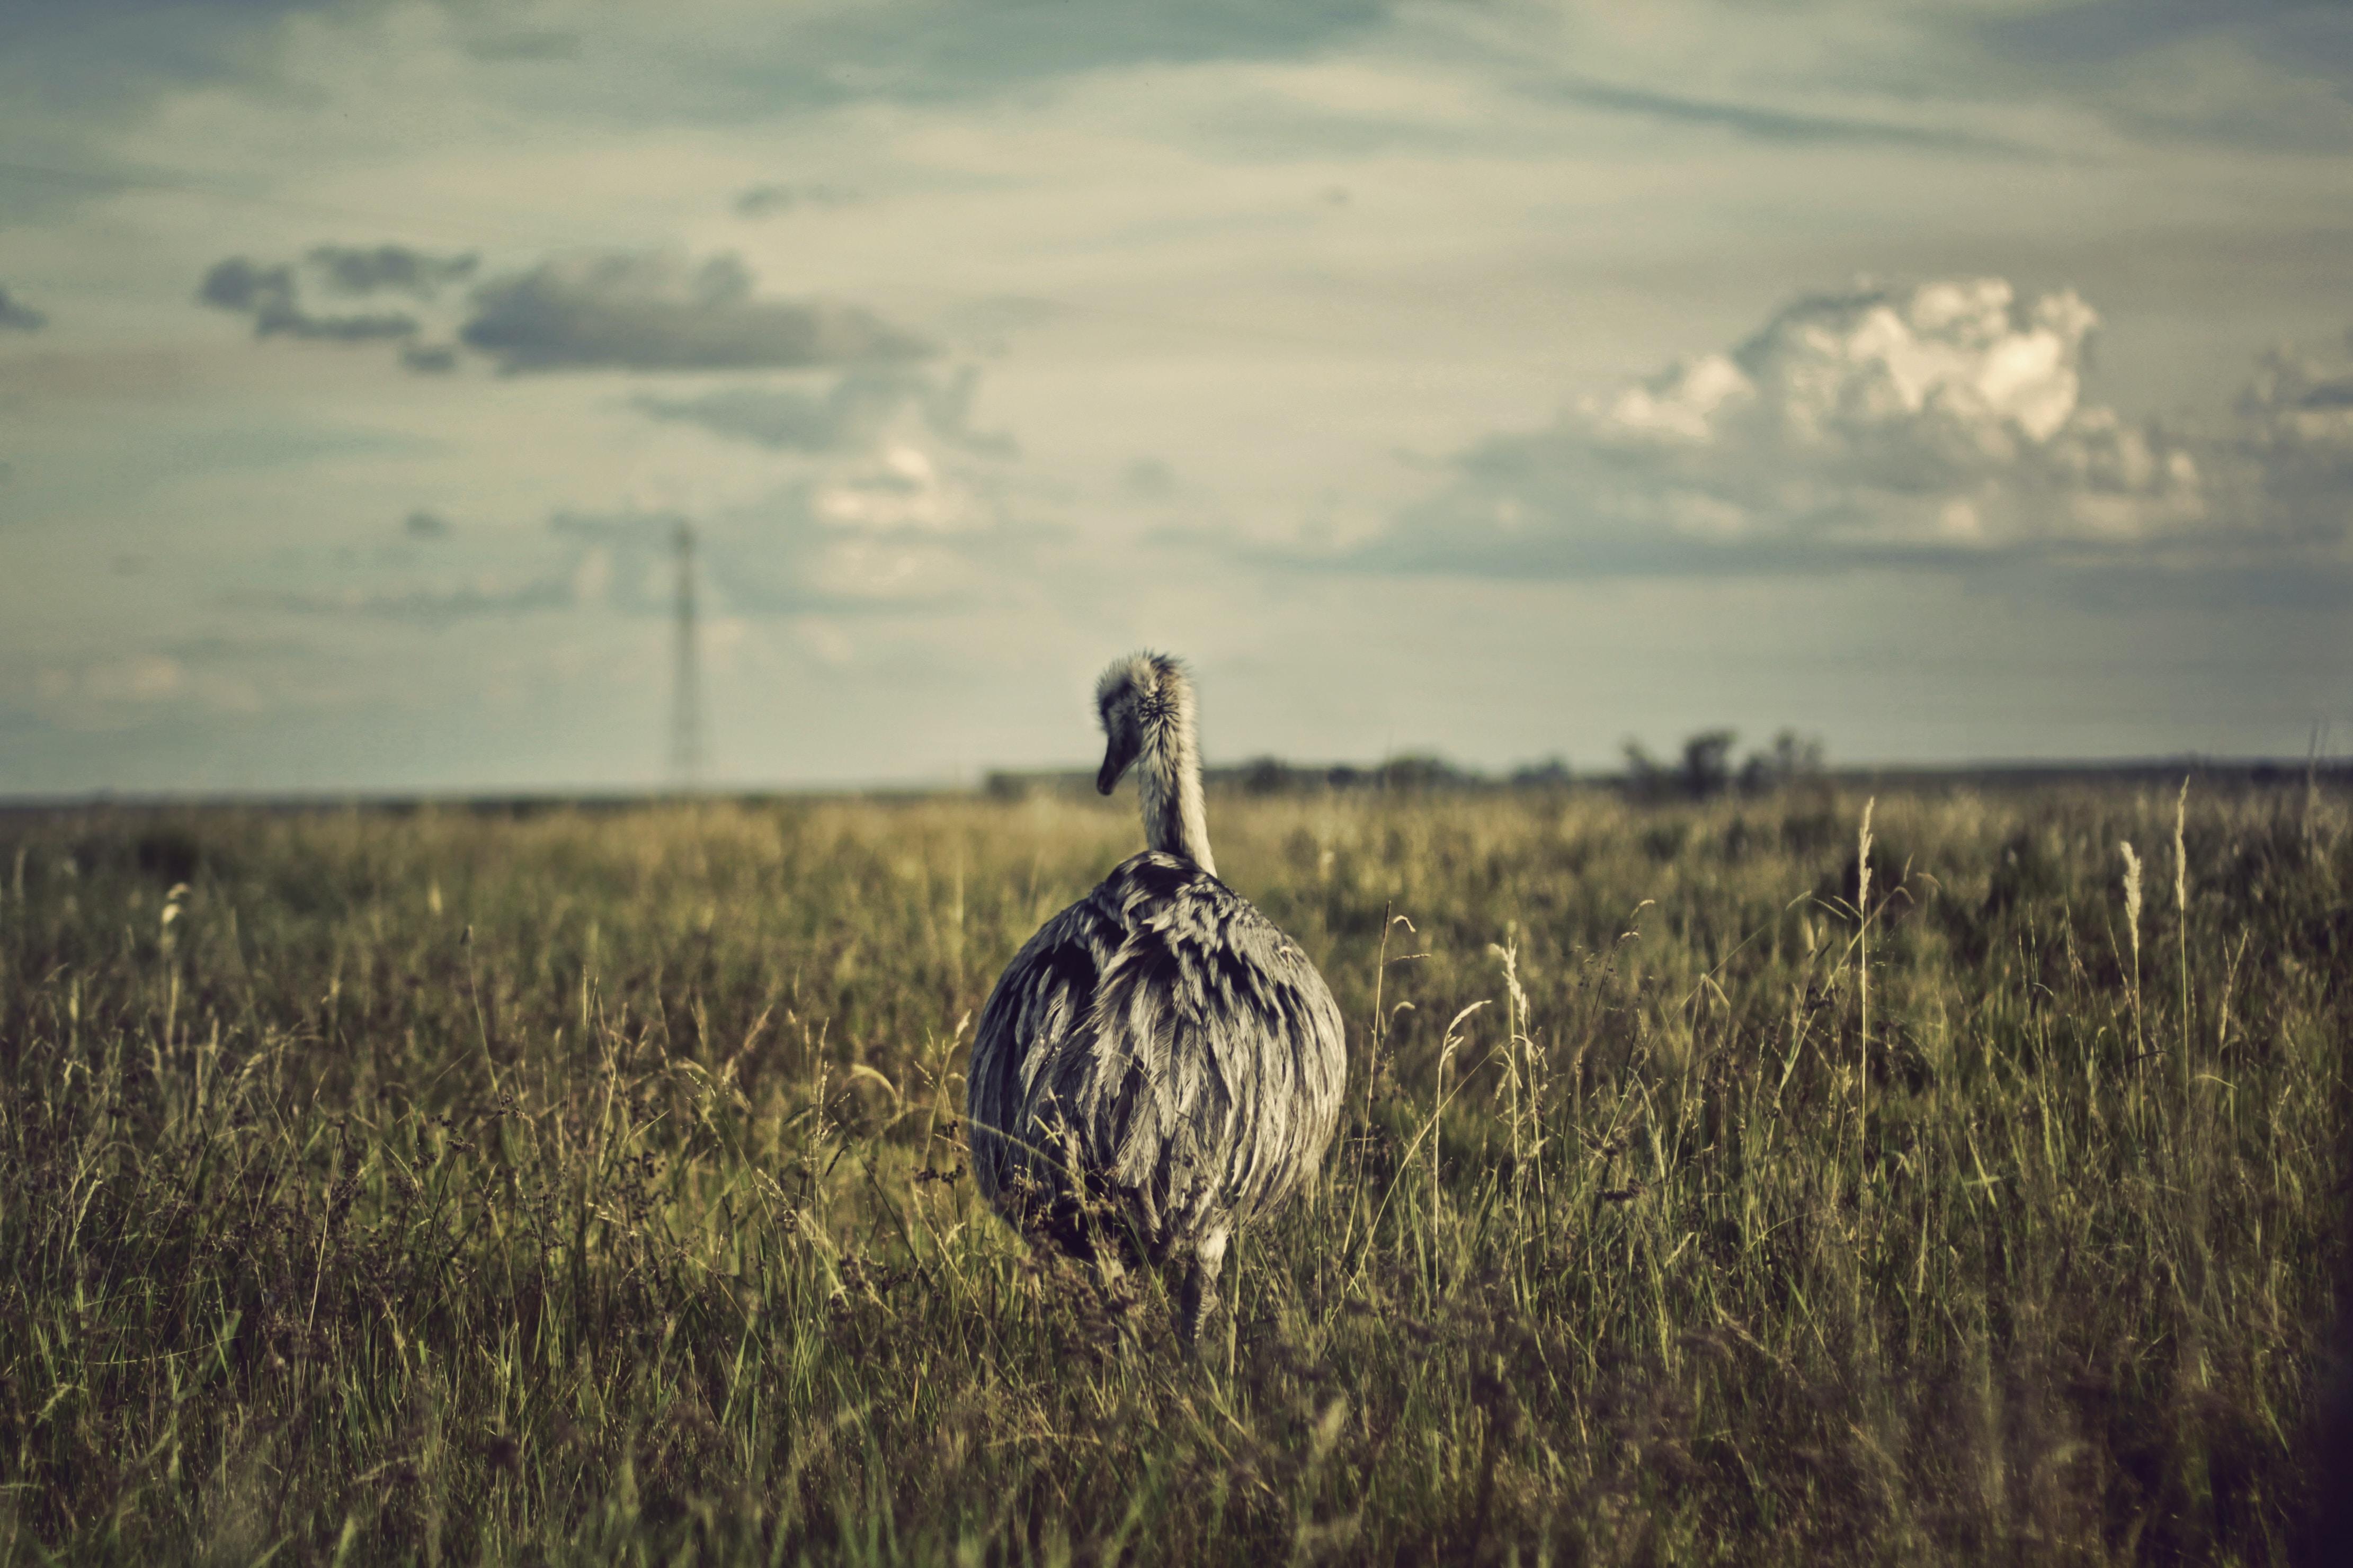 gray fowl on grass field